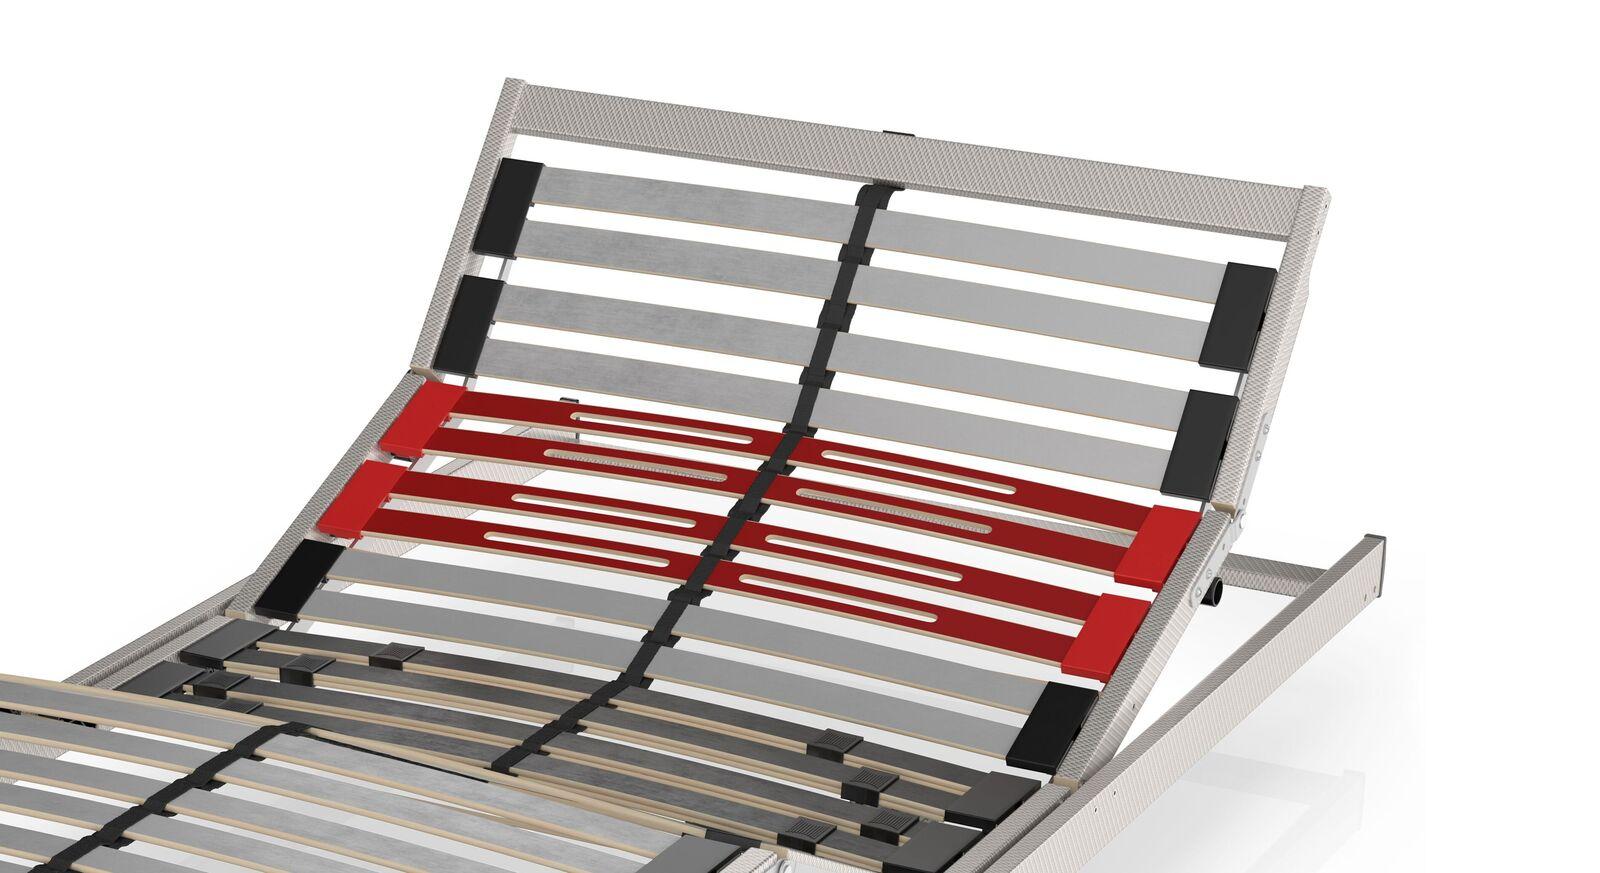 Schlaraffia Elektro-Lattenrost Classic 28 M mit optimierten Zonen